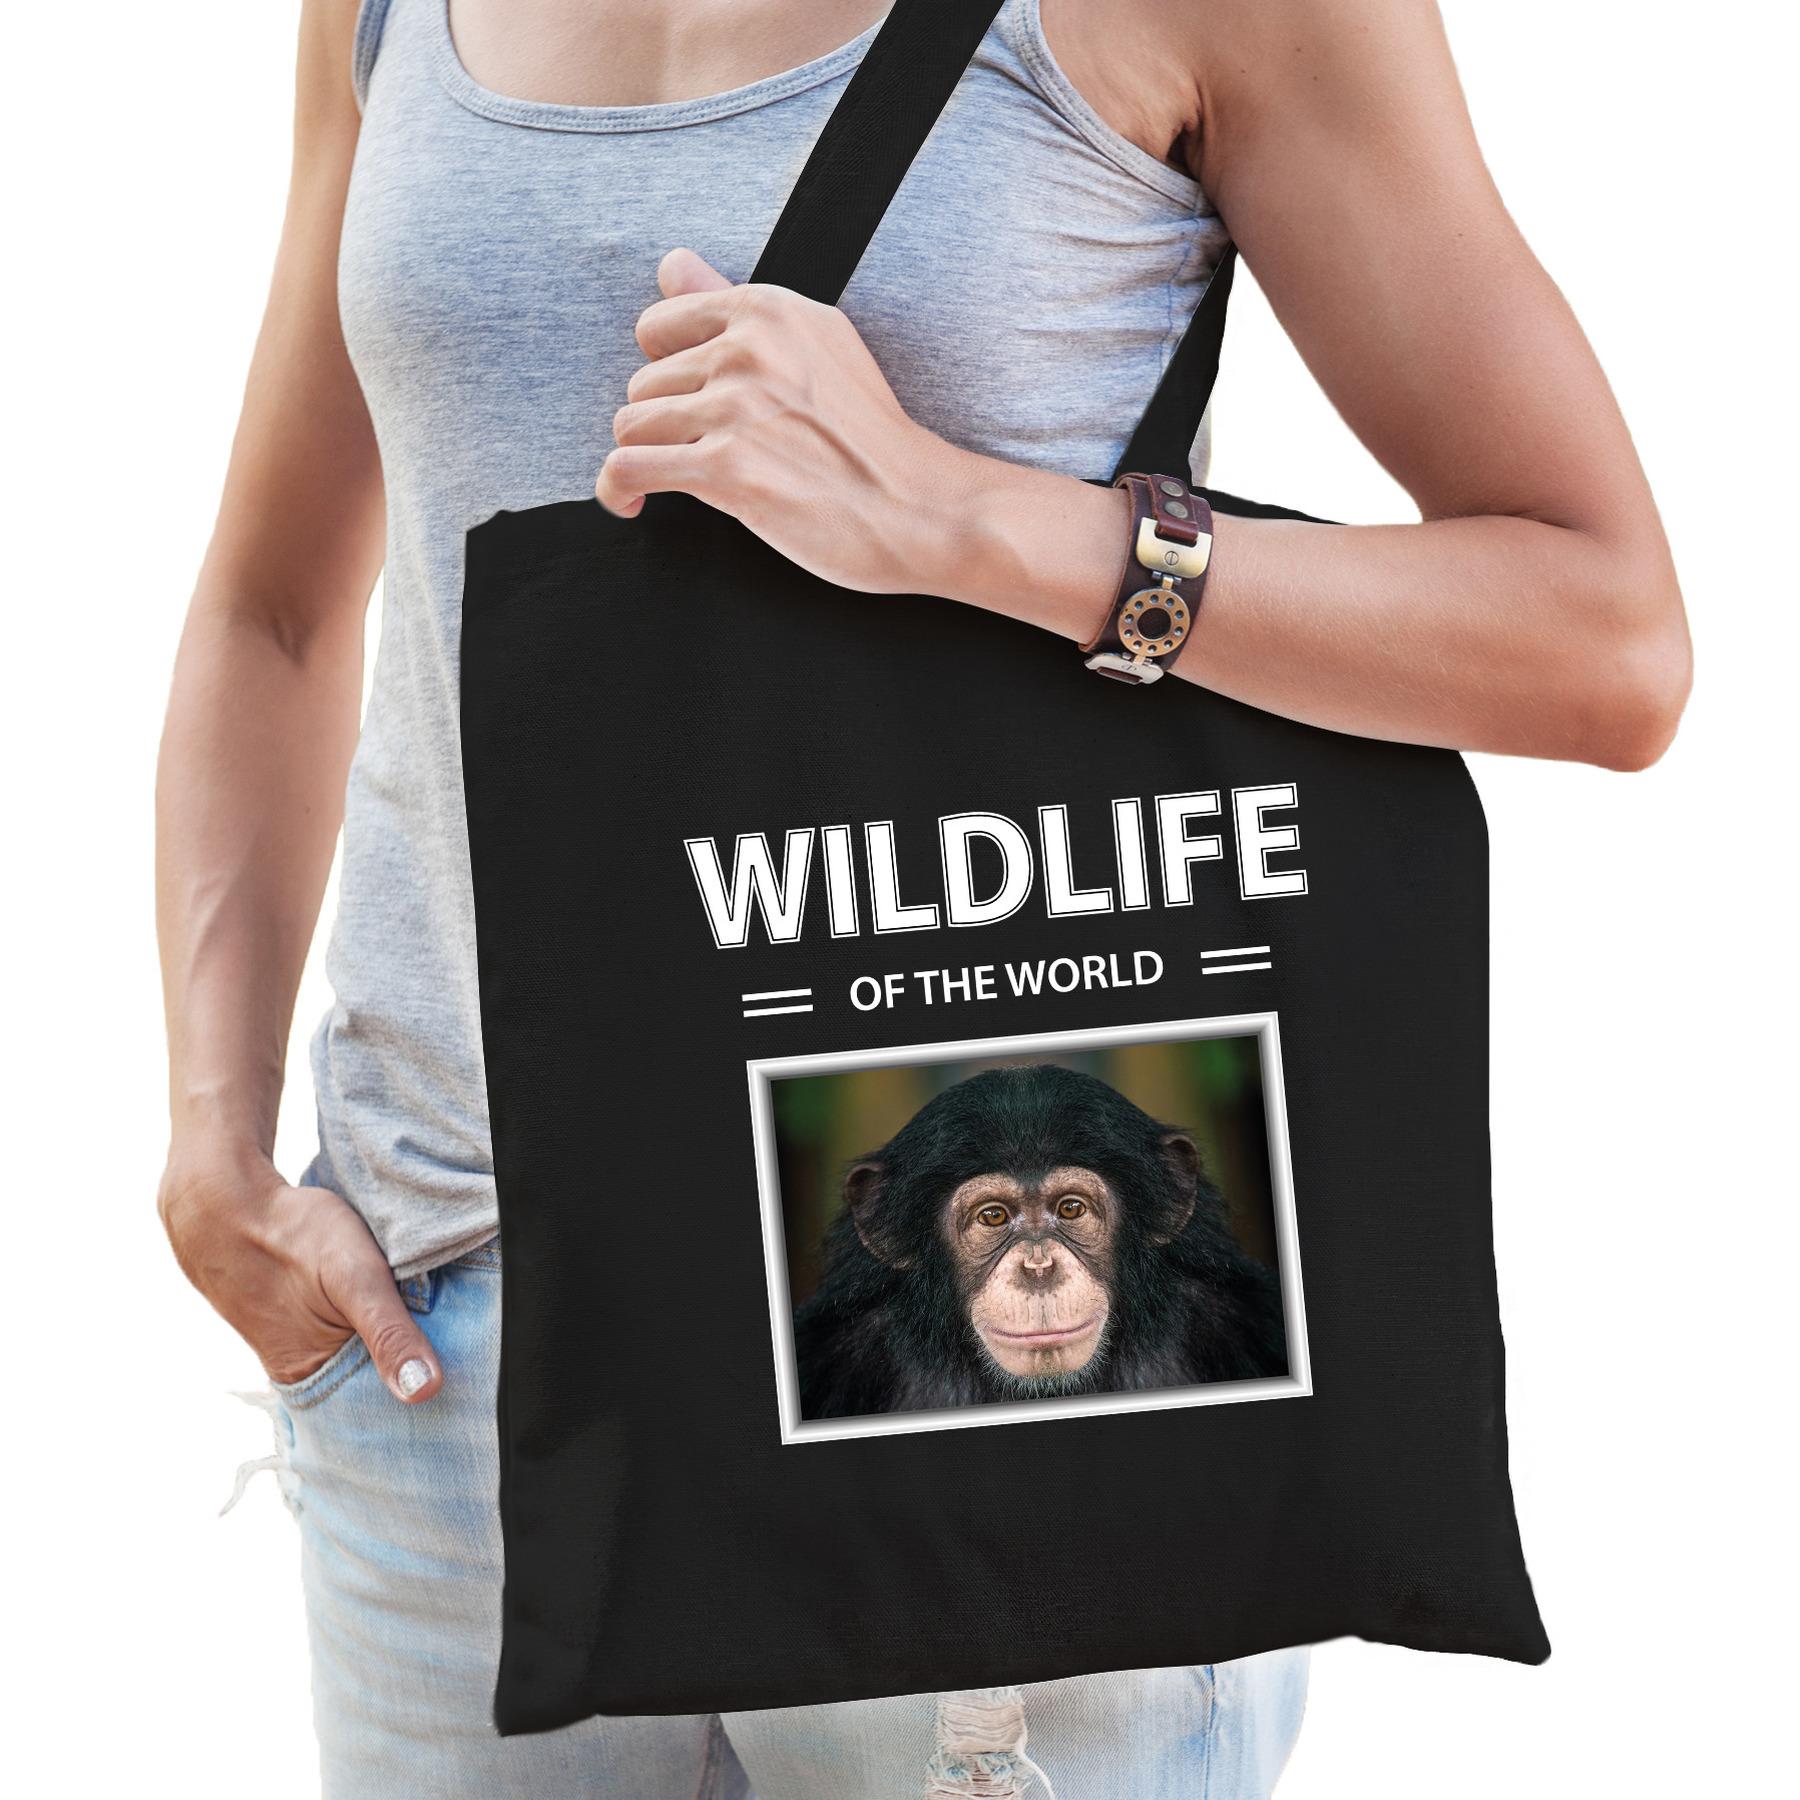 Katoenen tasje Chimpansee apen zwart - wildlife of the world Aap cadeau tas